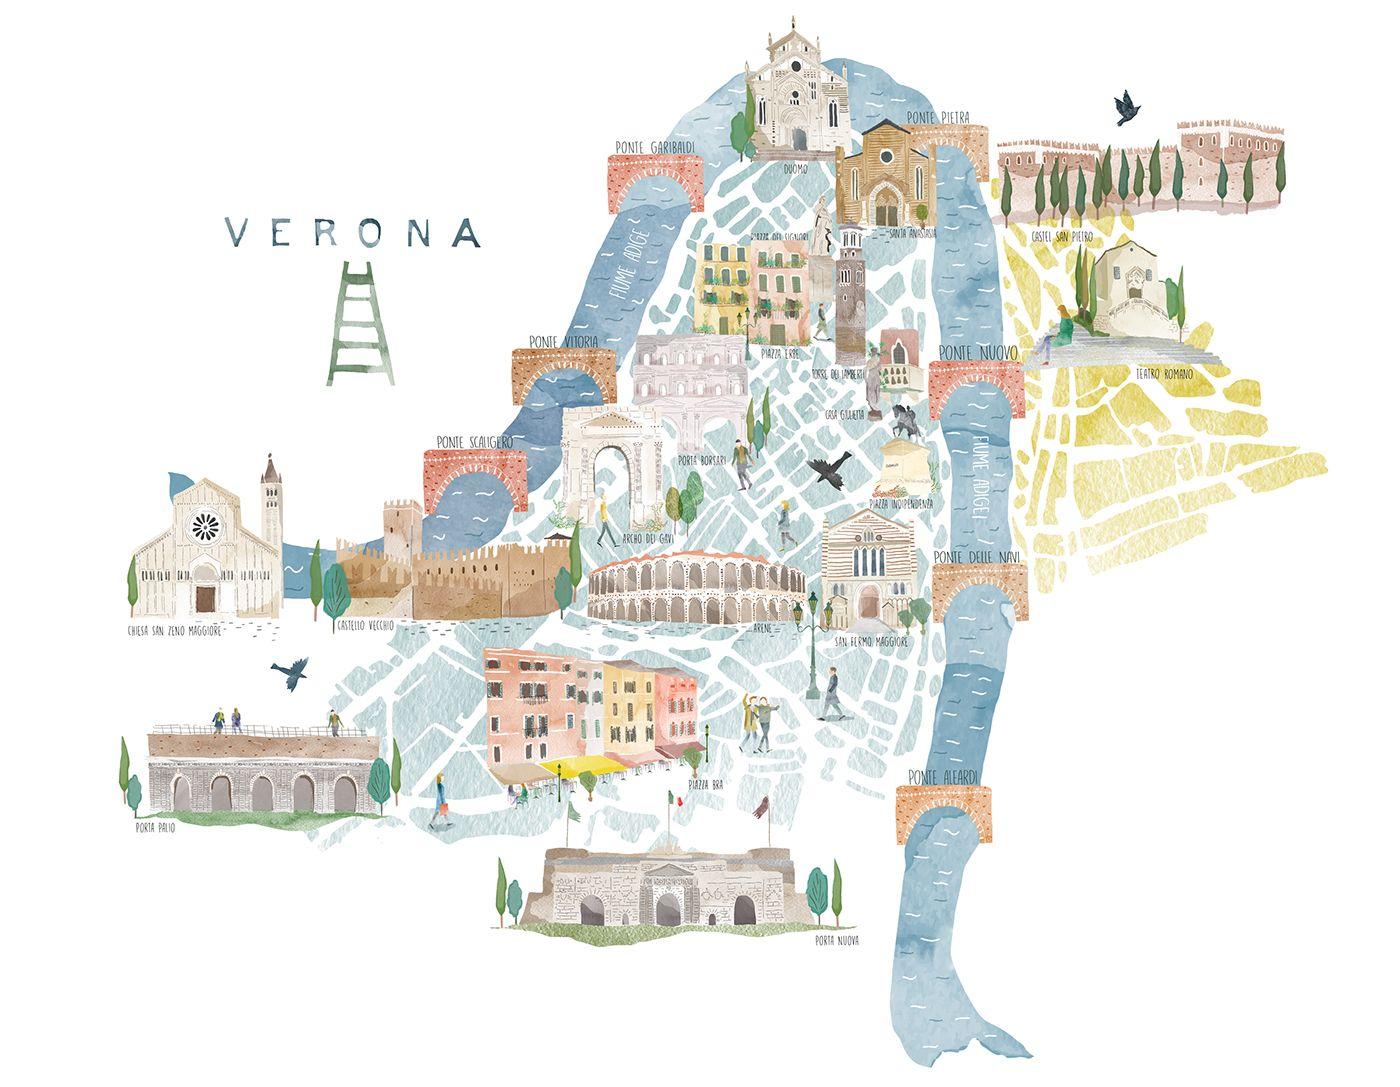 verona italy carte - photo#17